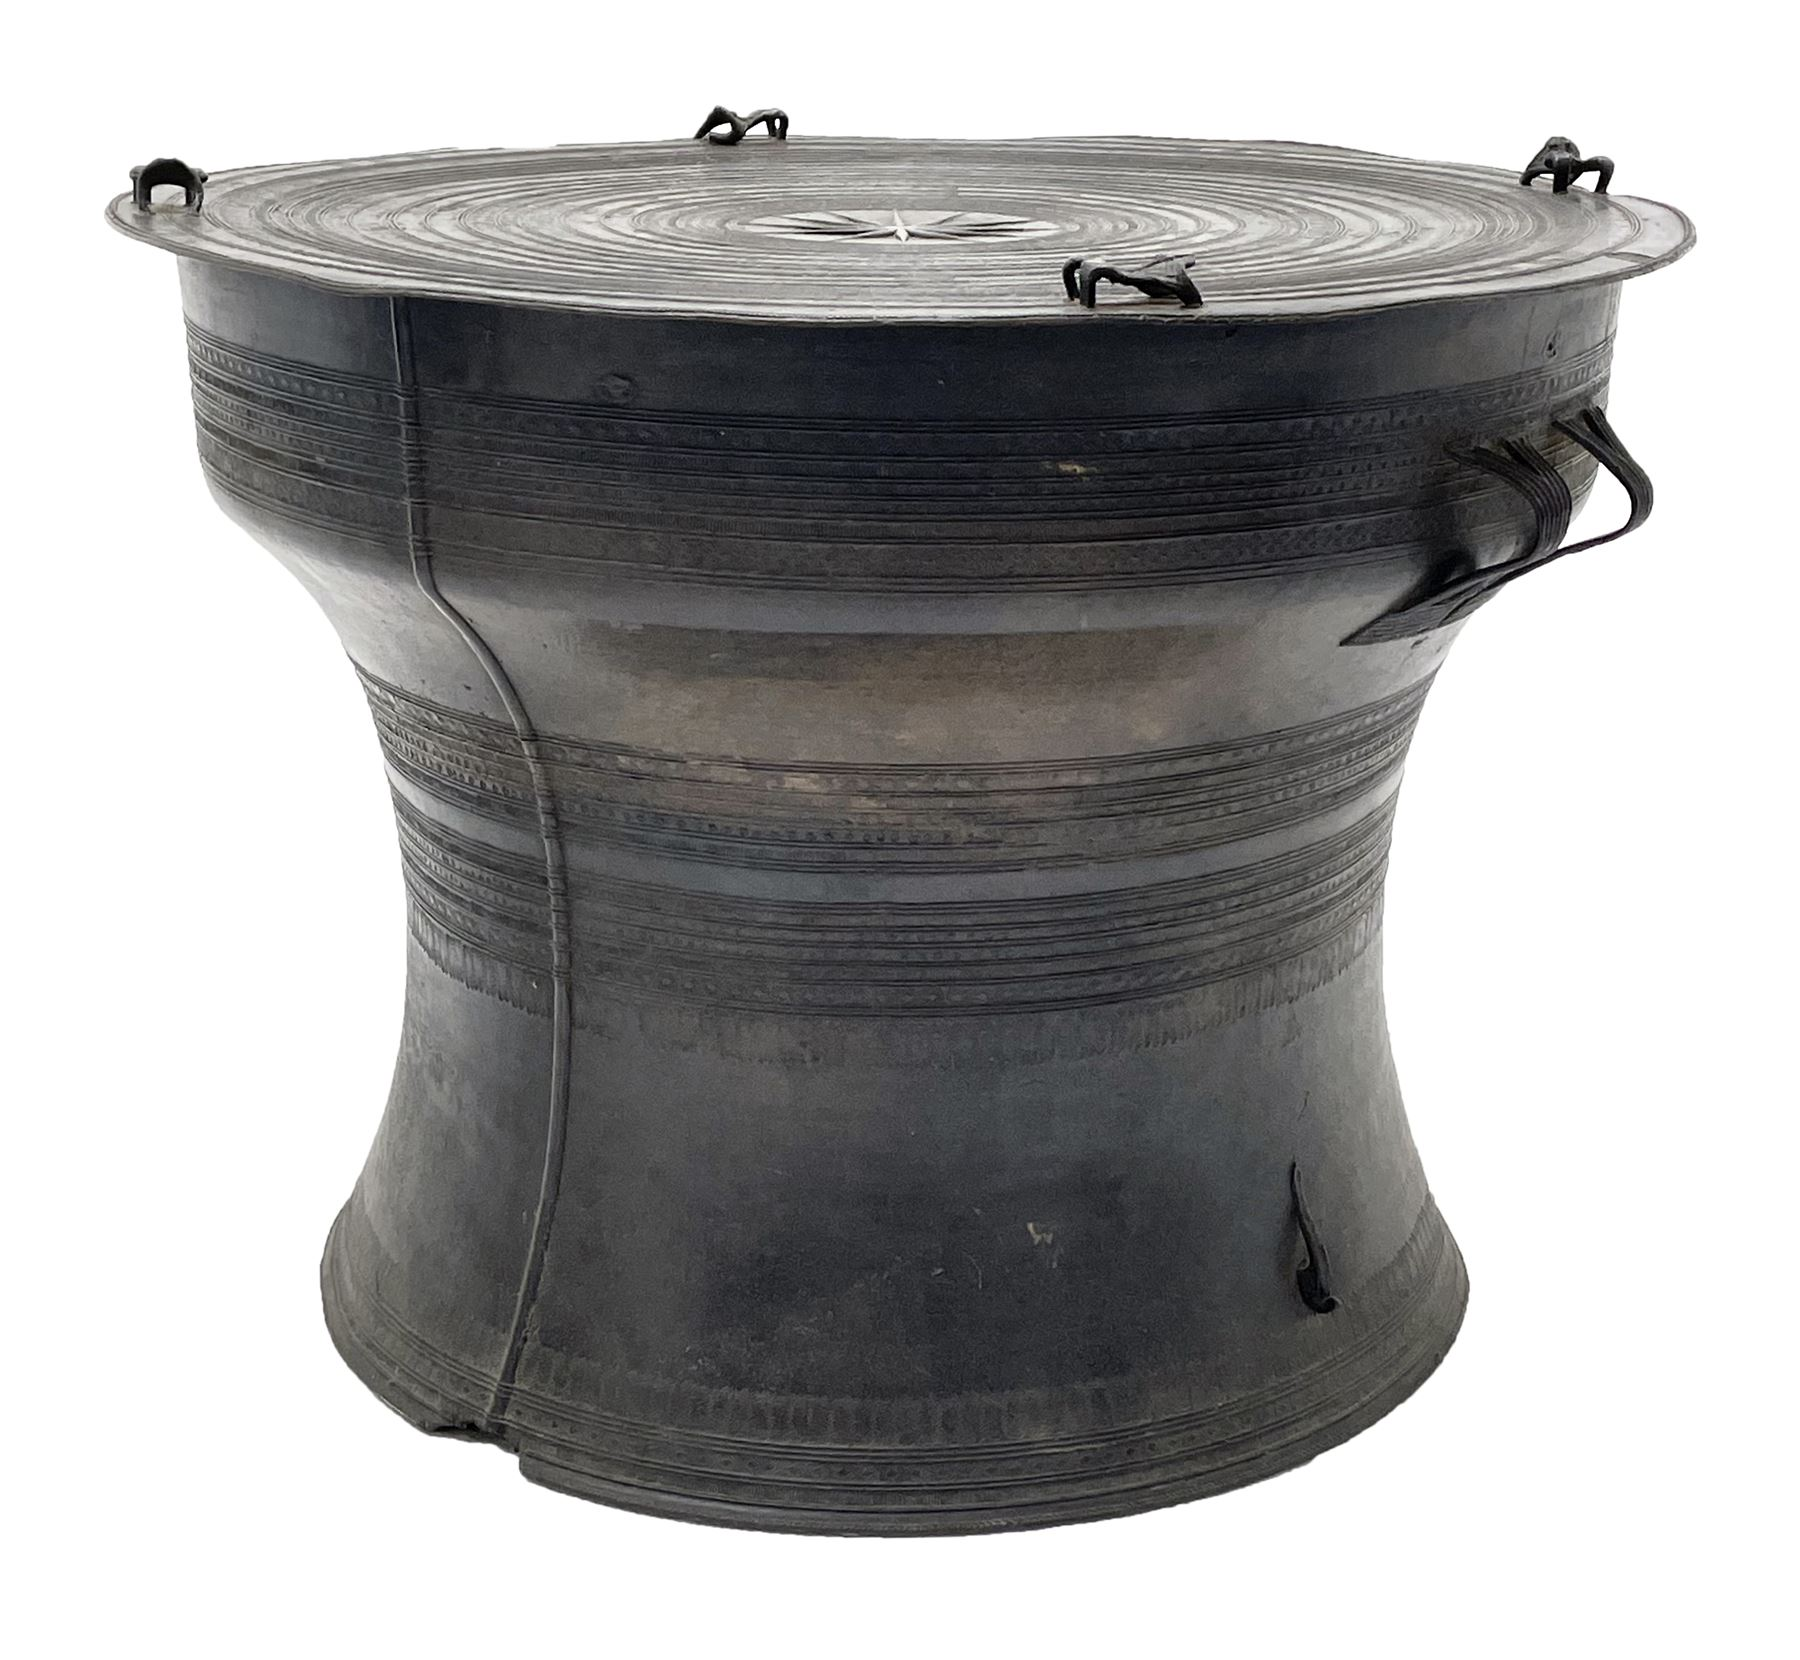 Dong Son style Southeast Asian bronze rain drum